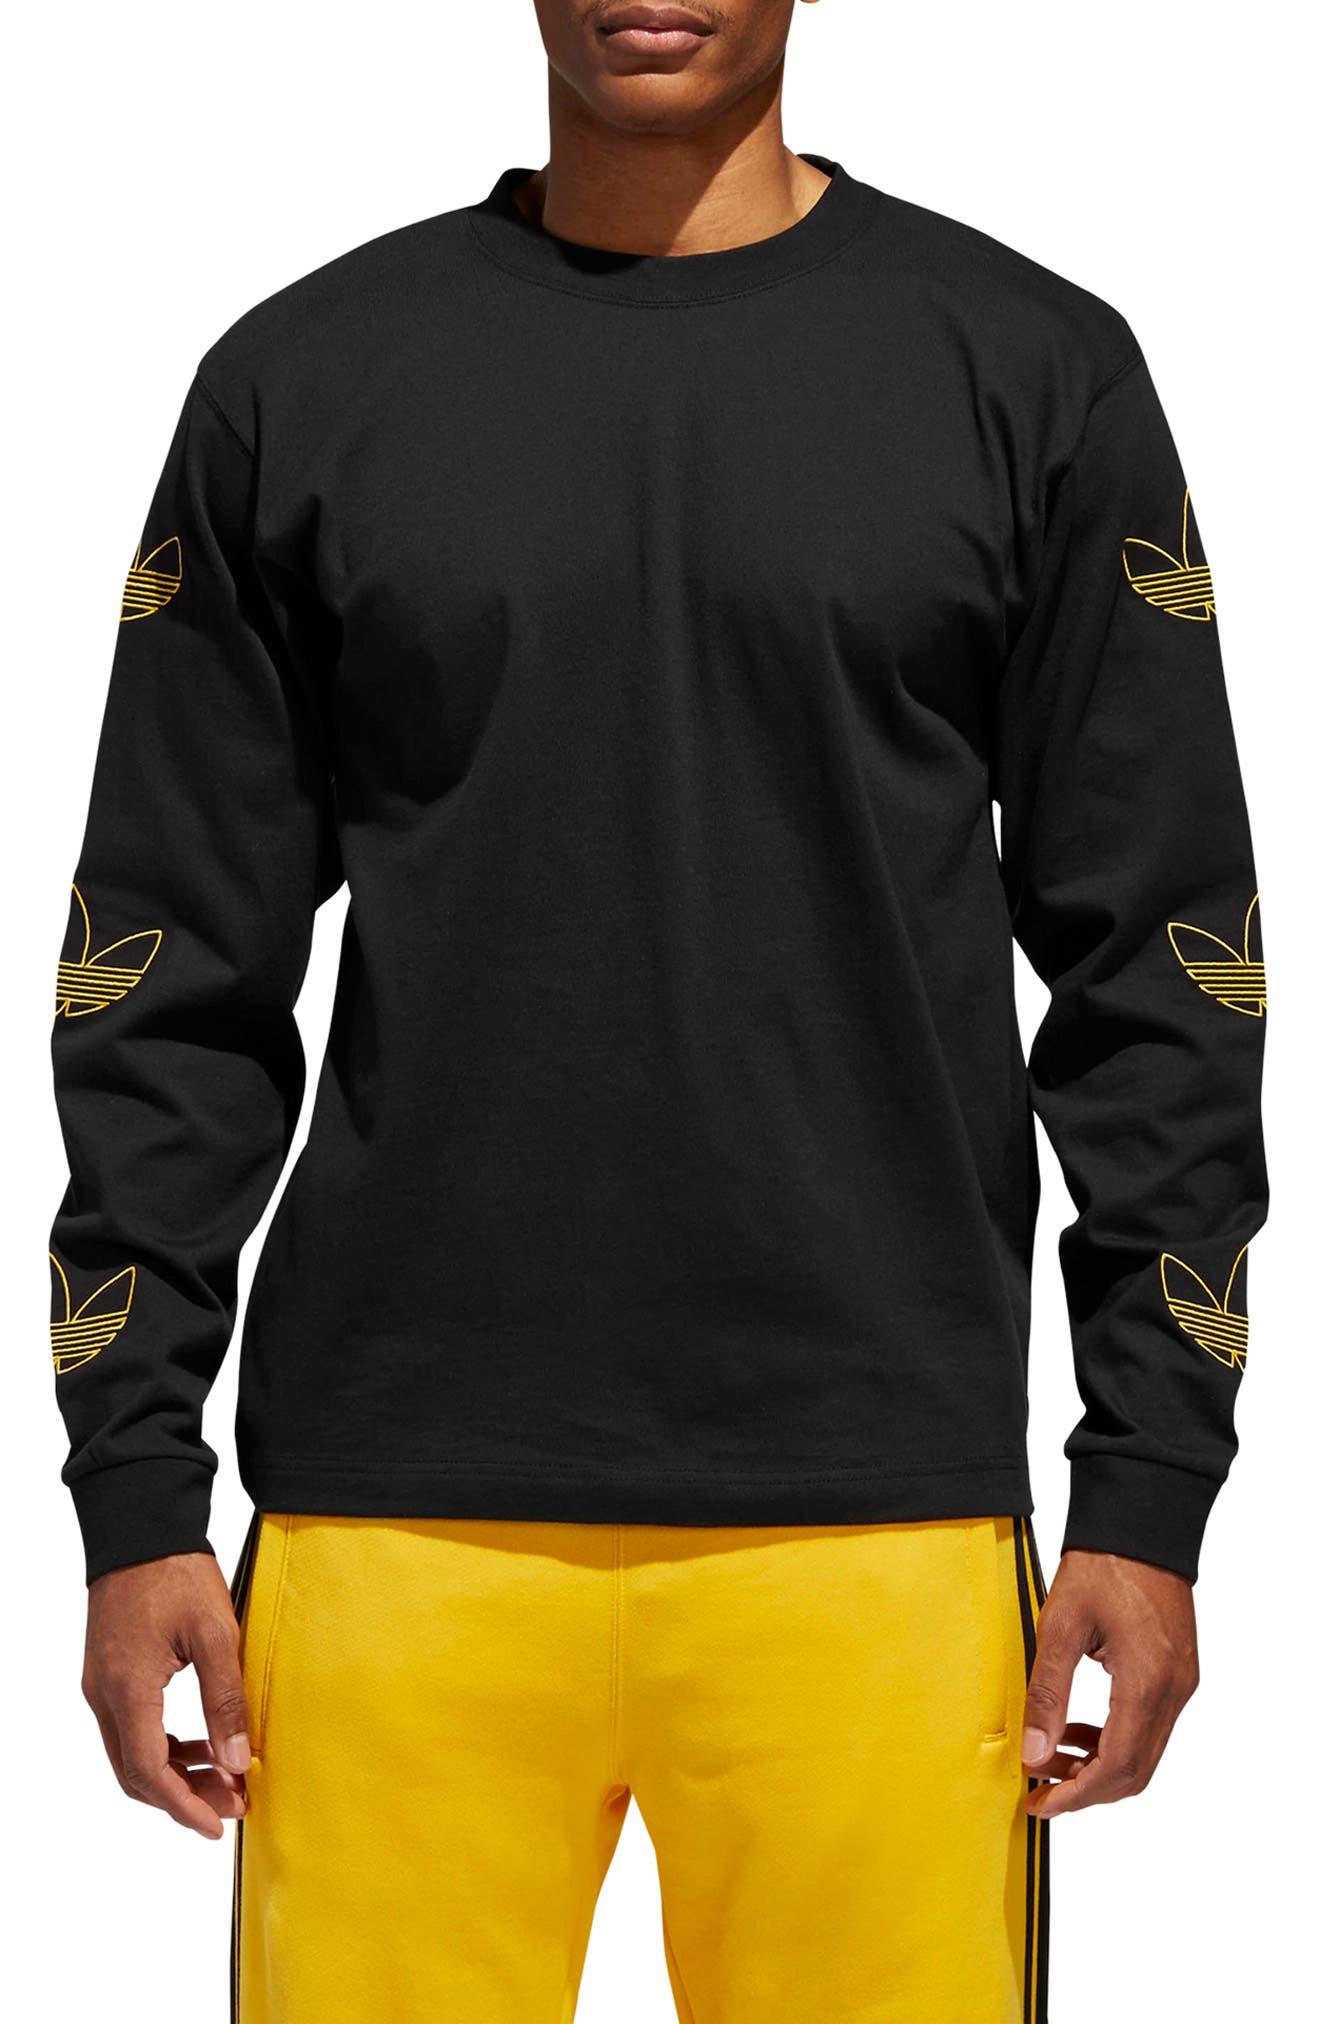 ADIDAS ORIGINALS, Embroidered Trefoil Long Sleeve T-Shirt, Main thumbnail 1, color, BLACK/ WHITE